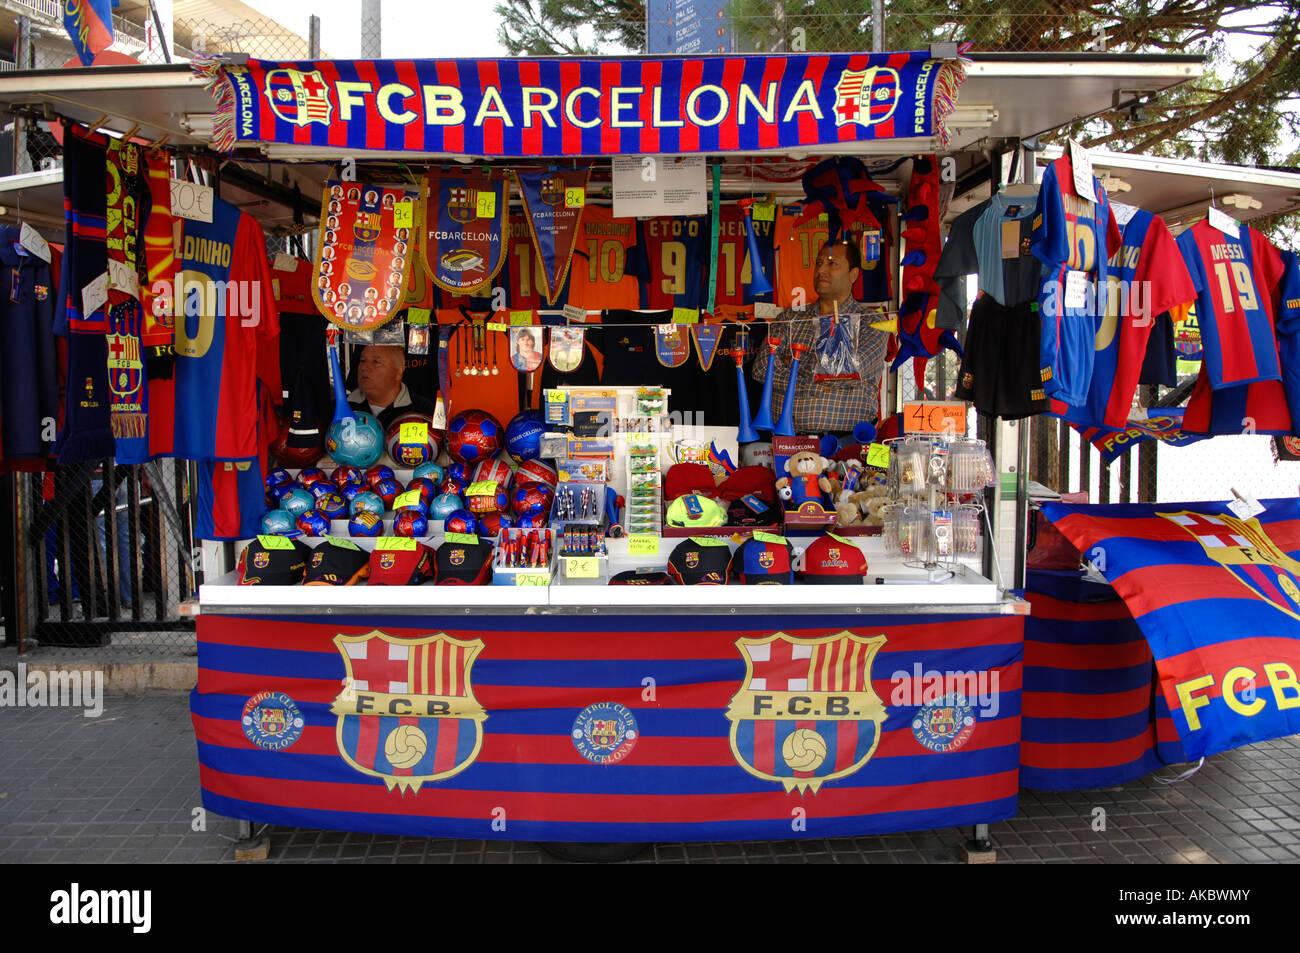 f838556eb Merchandise Shop of the FC Barcelona Stock Photo: 14951690 - Alamy